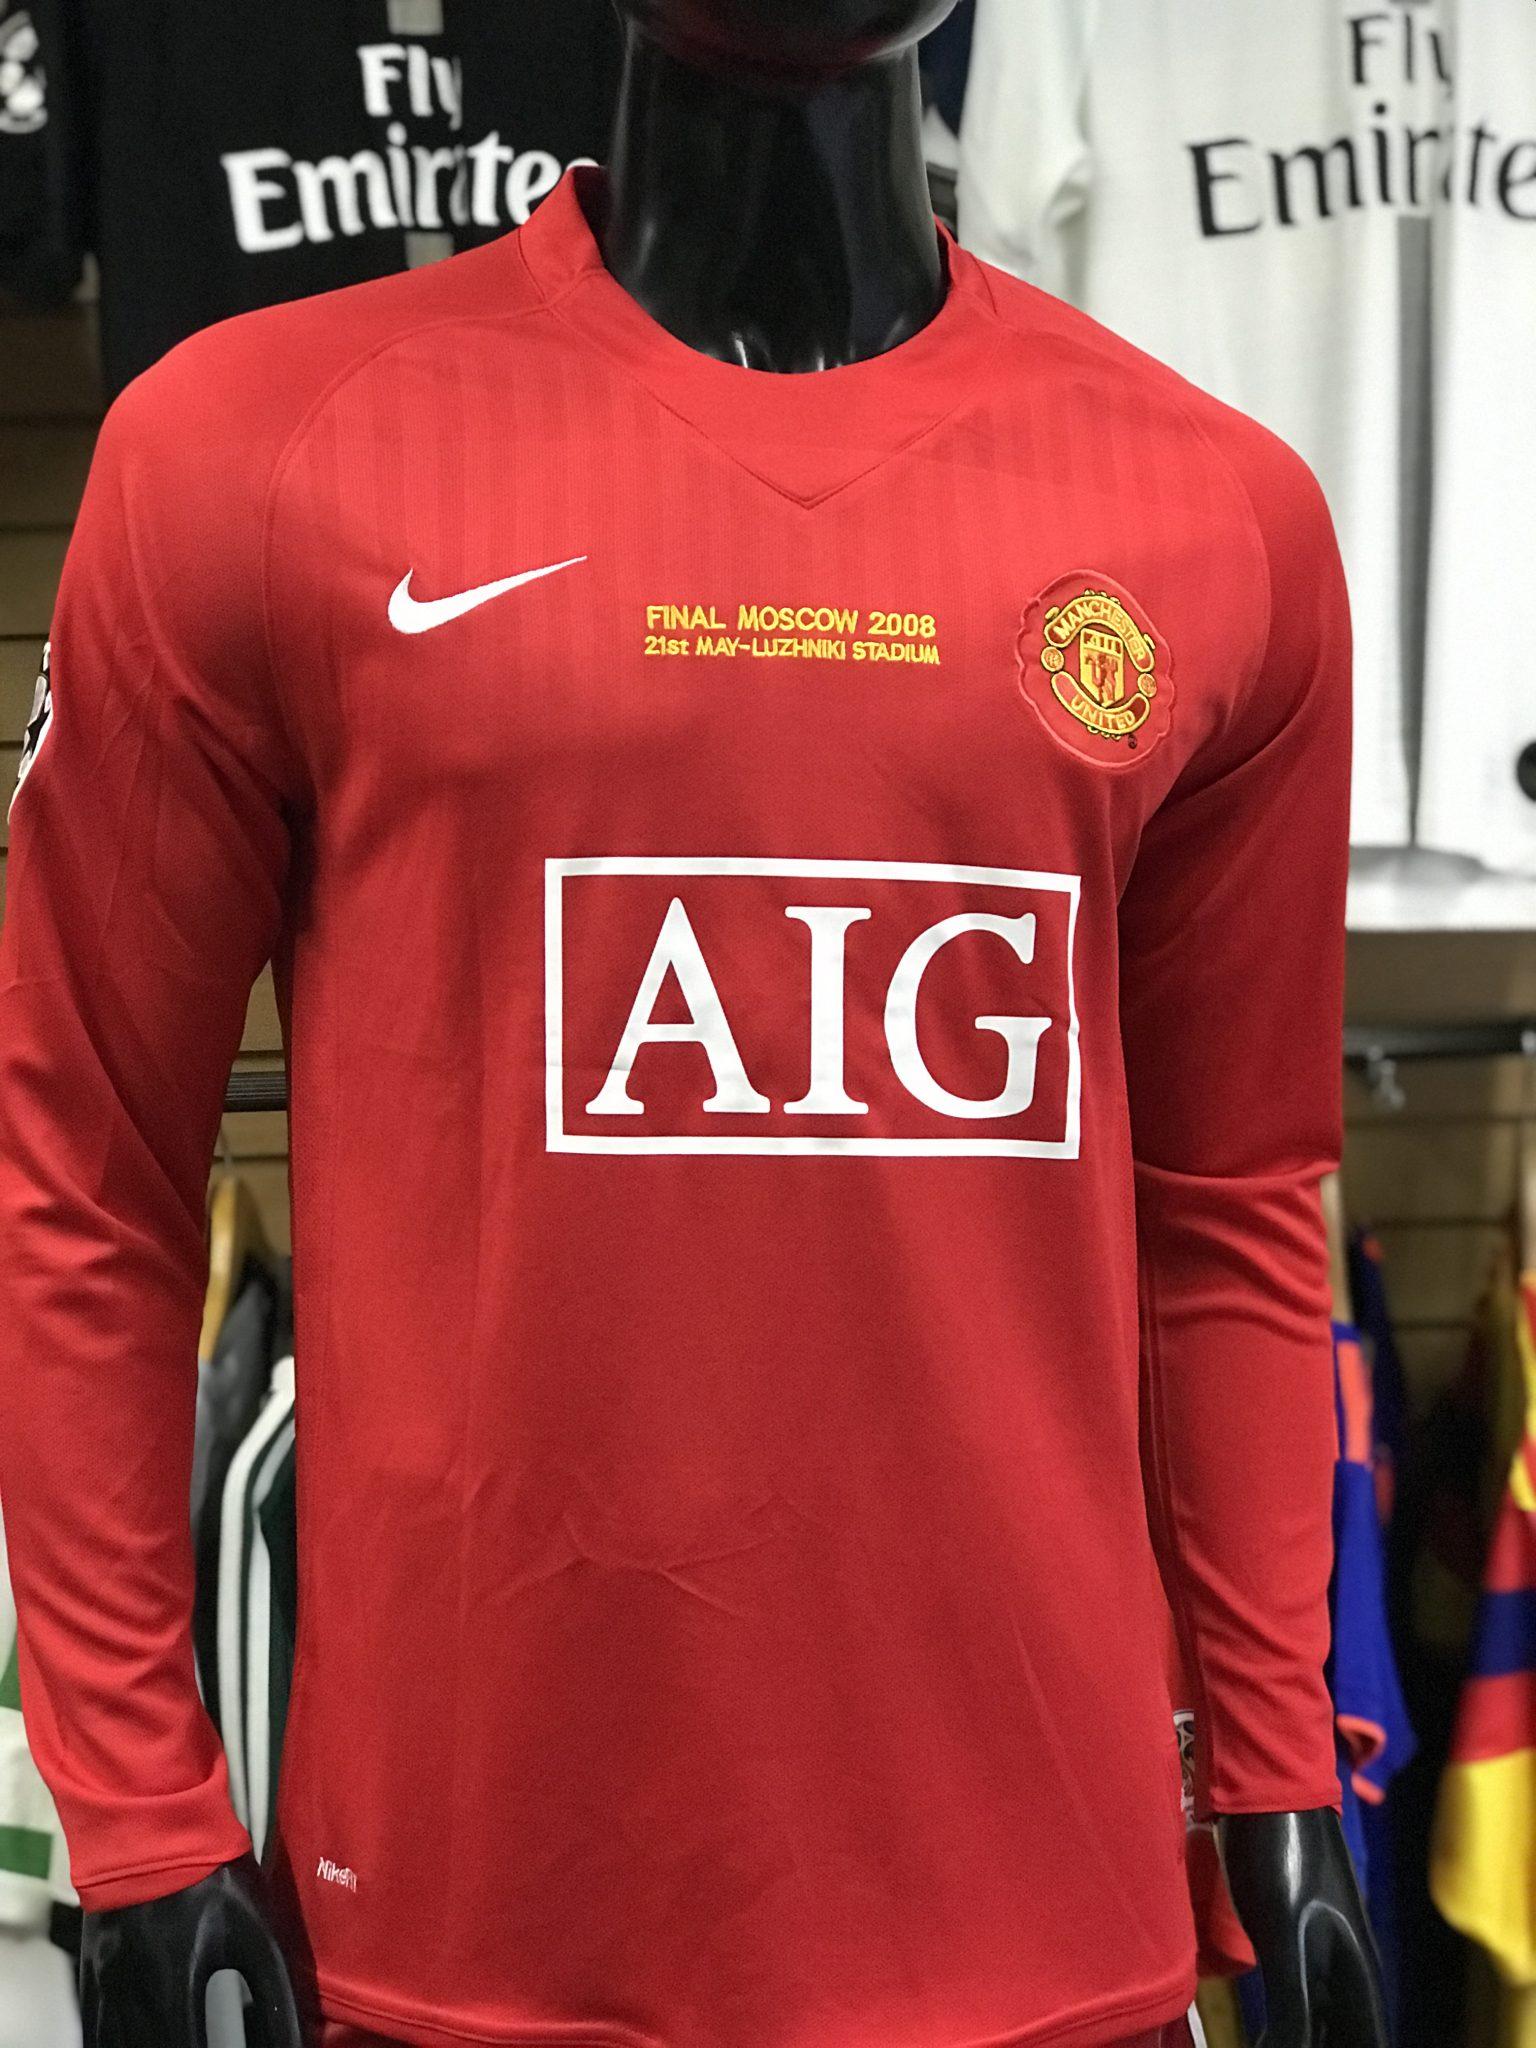 e3dfd8477 Camiseta Manga Larga Manchester United 2007-2008 Cristiano Ronaldo ...